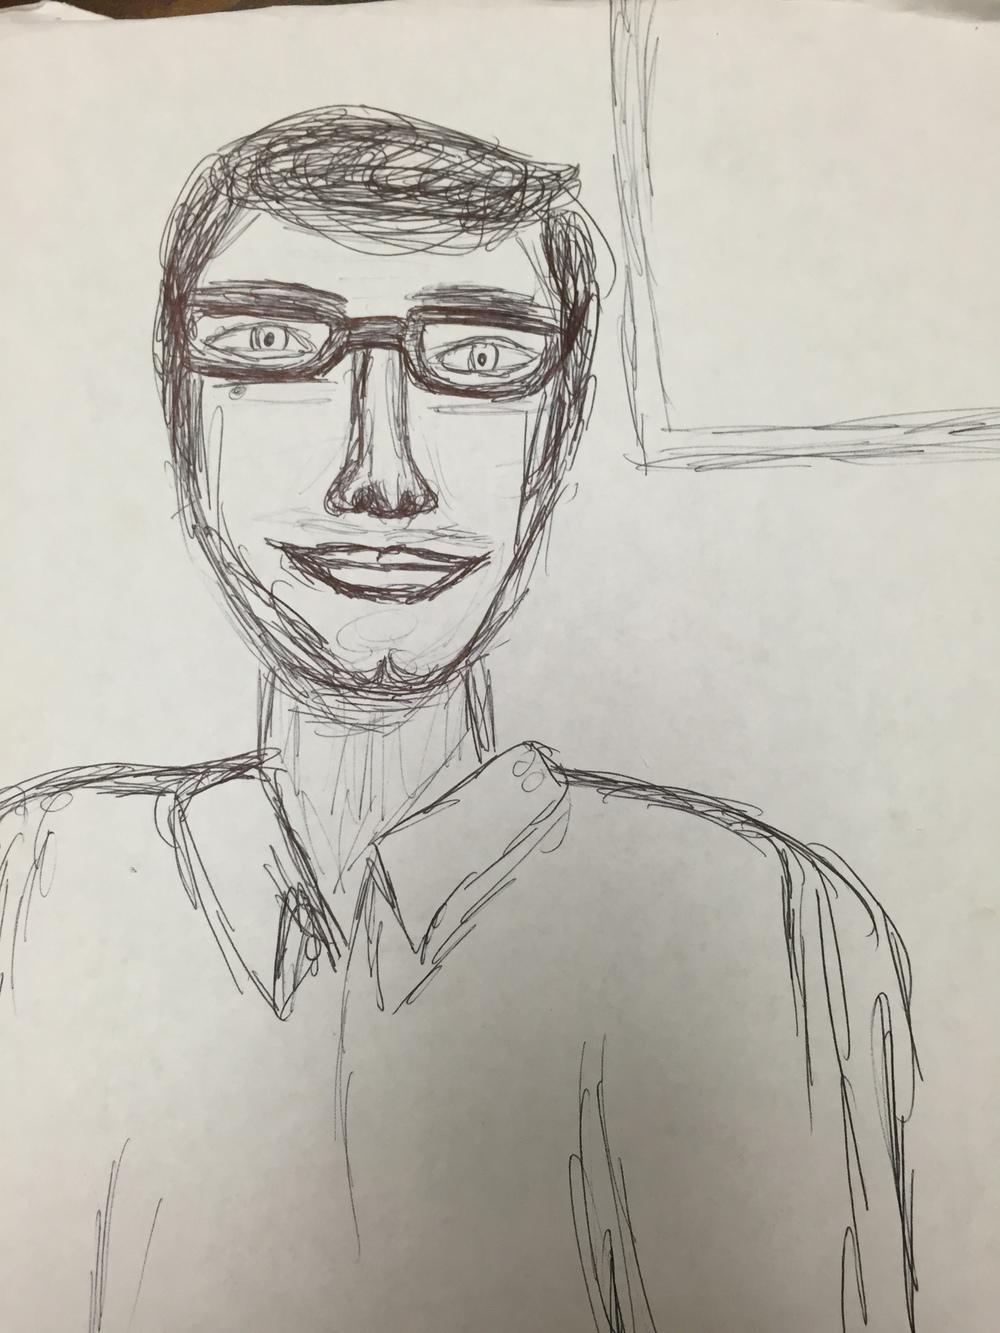 A student's classroom portrait